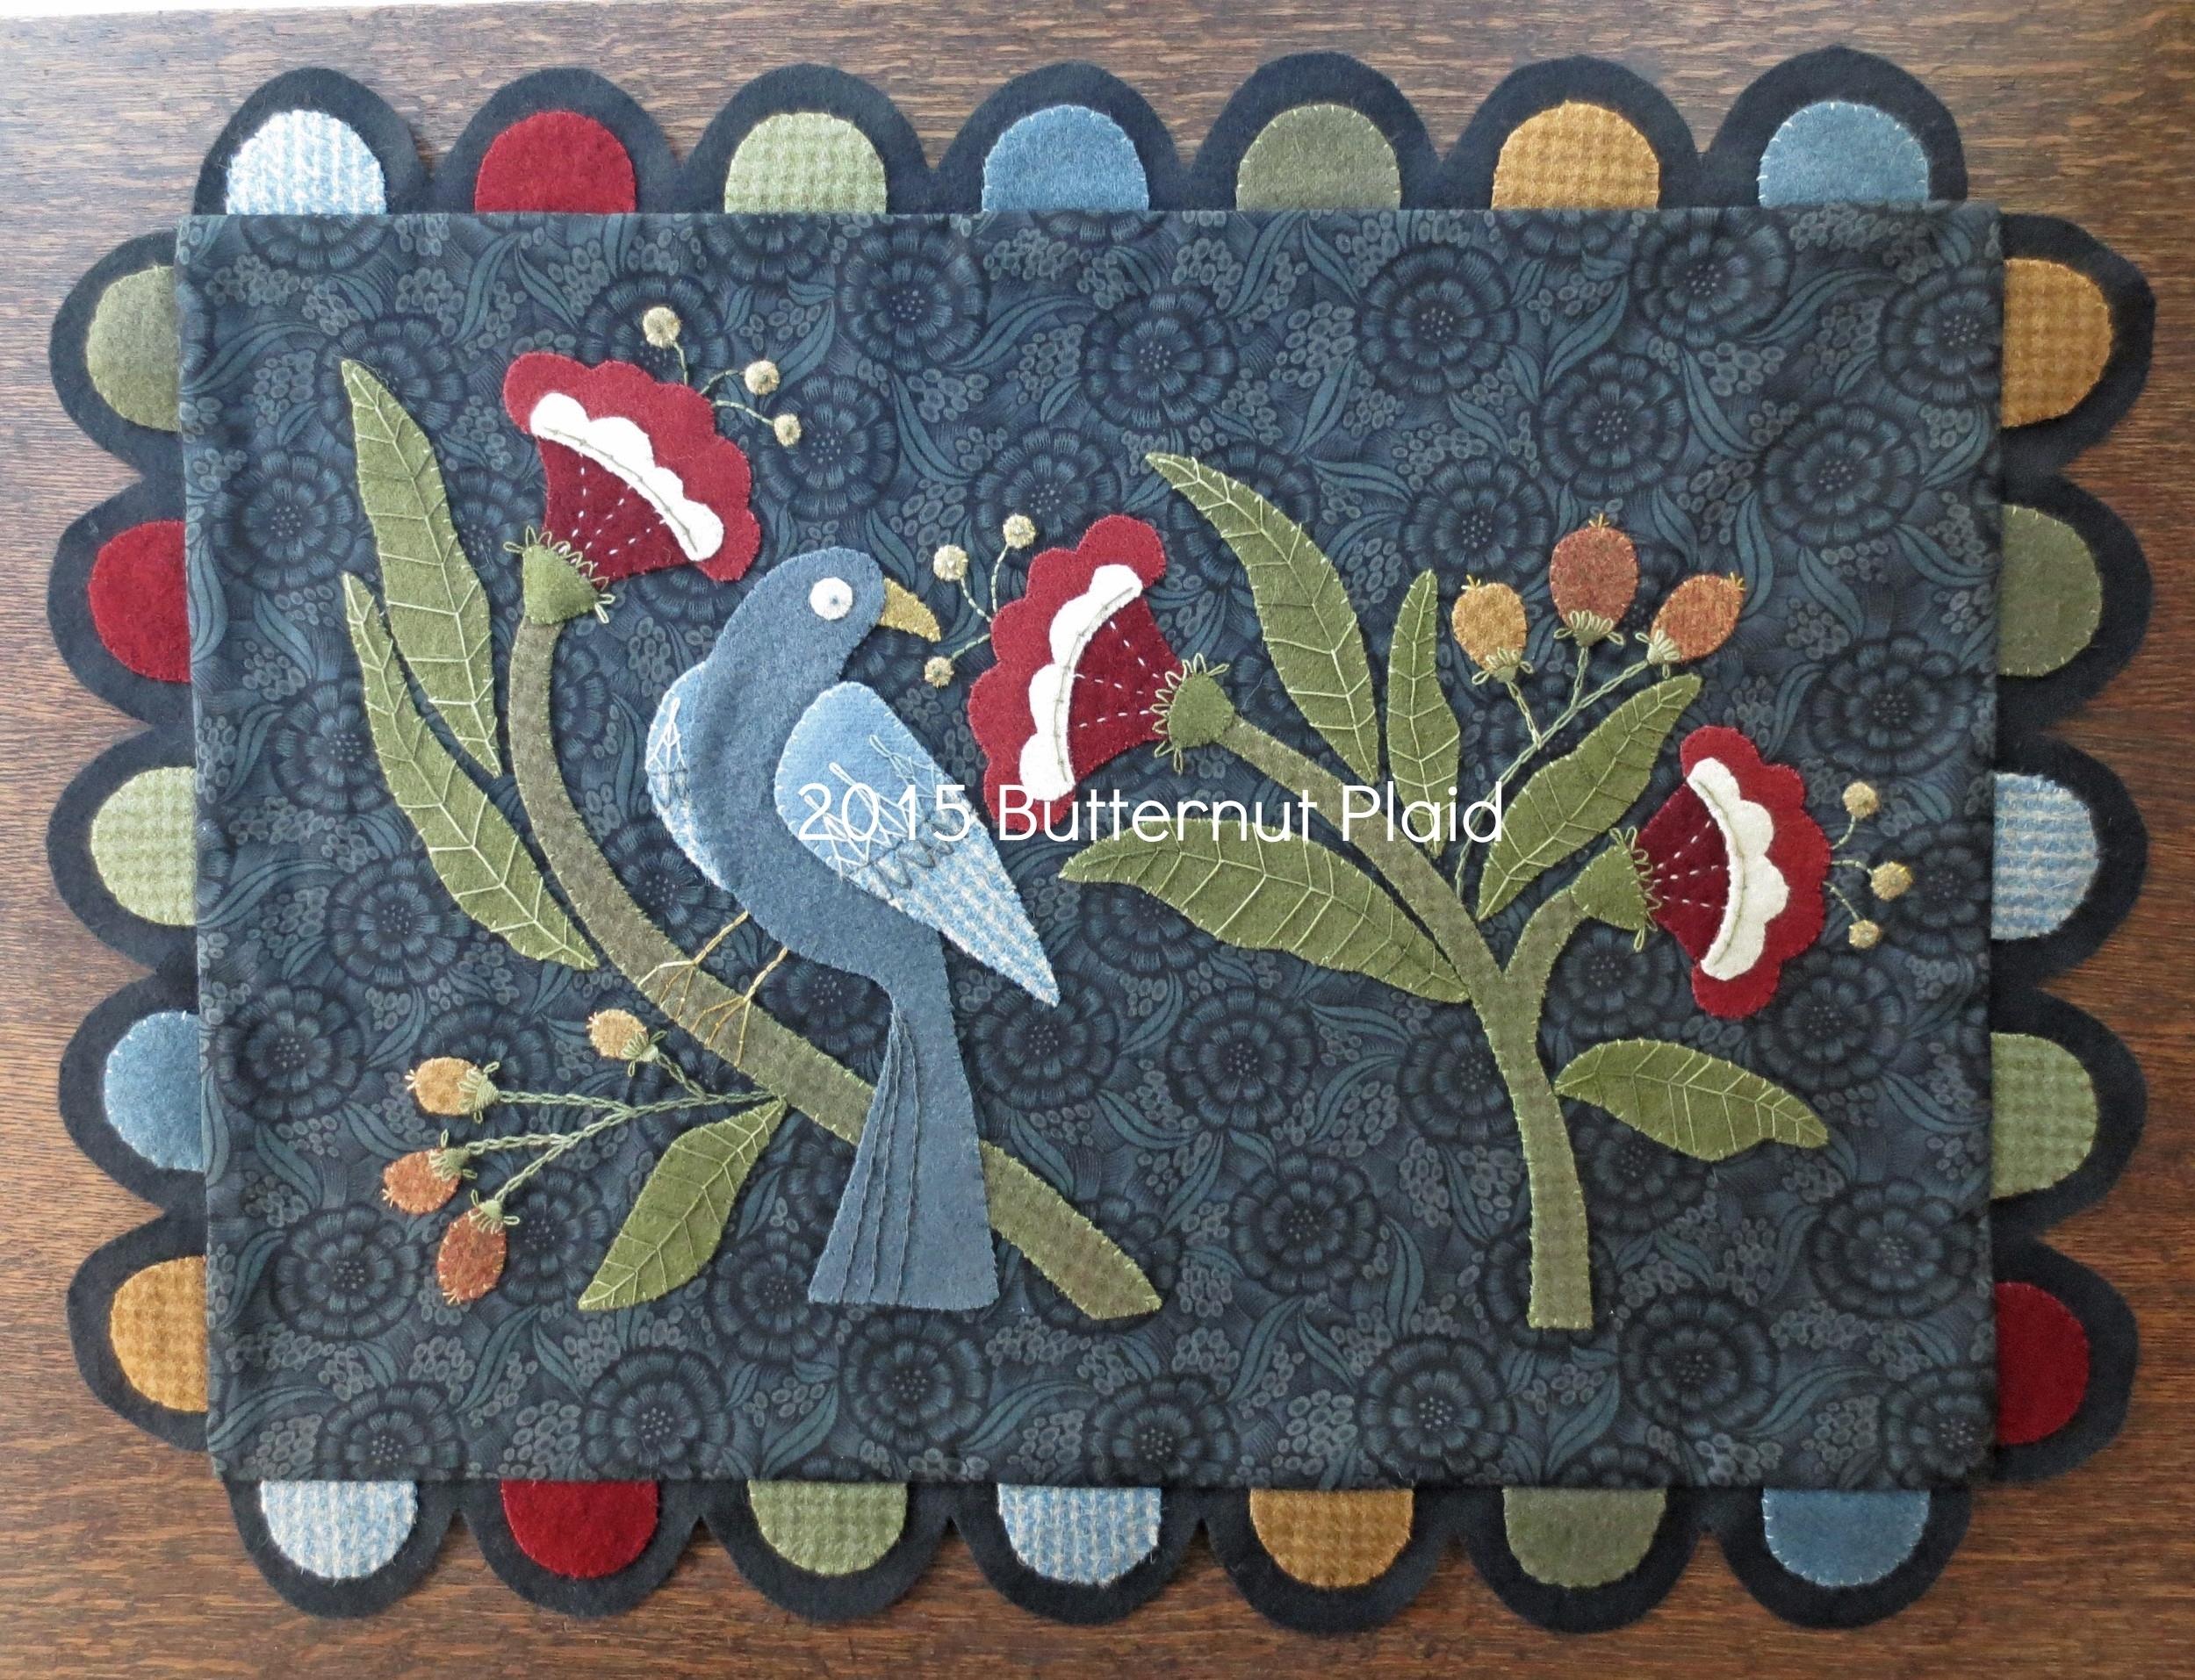 William Morris Inspired Table Rug.jpg